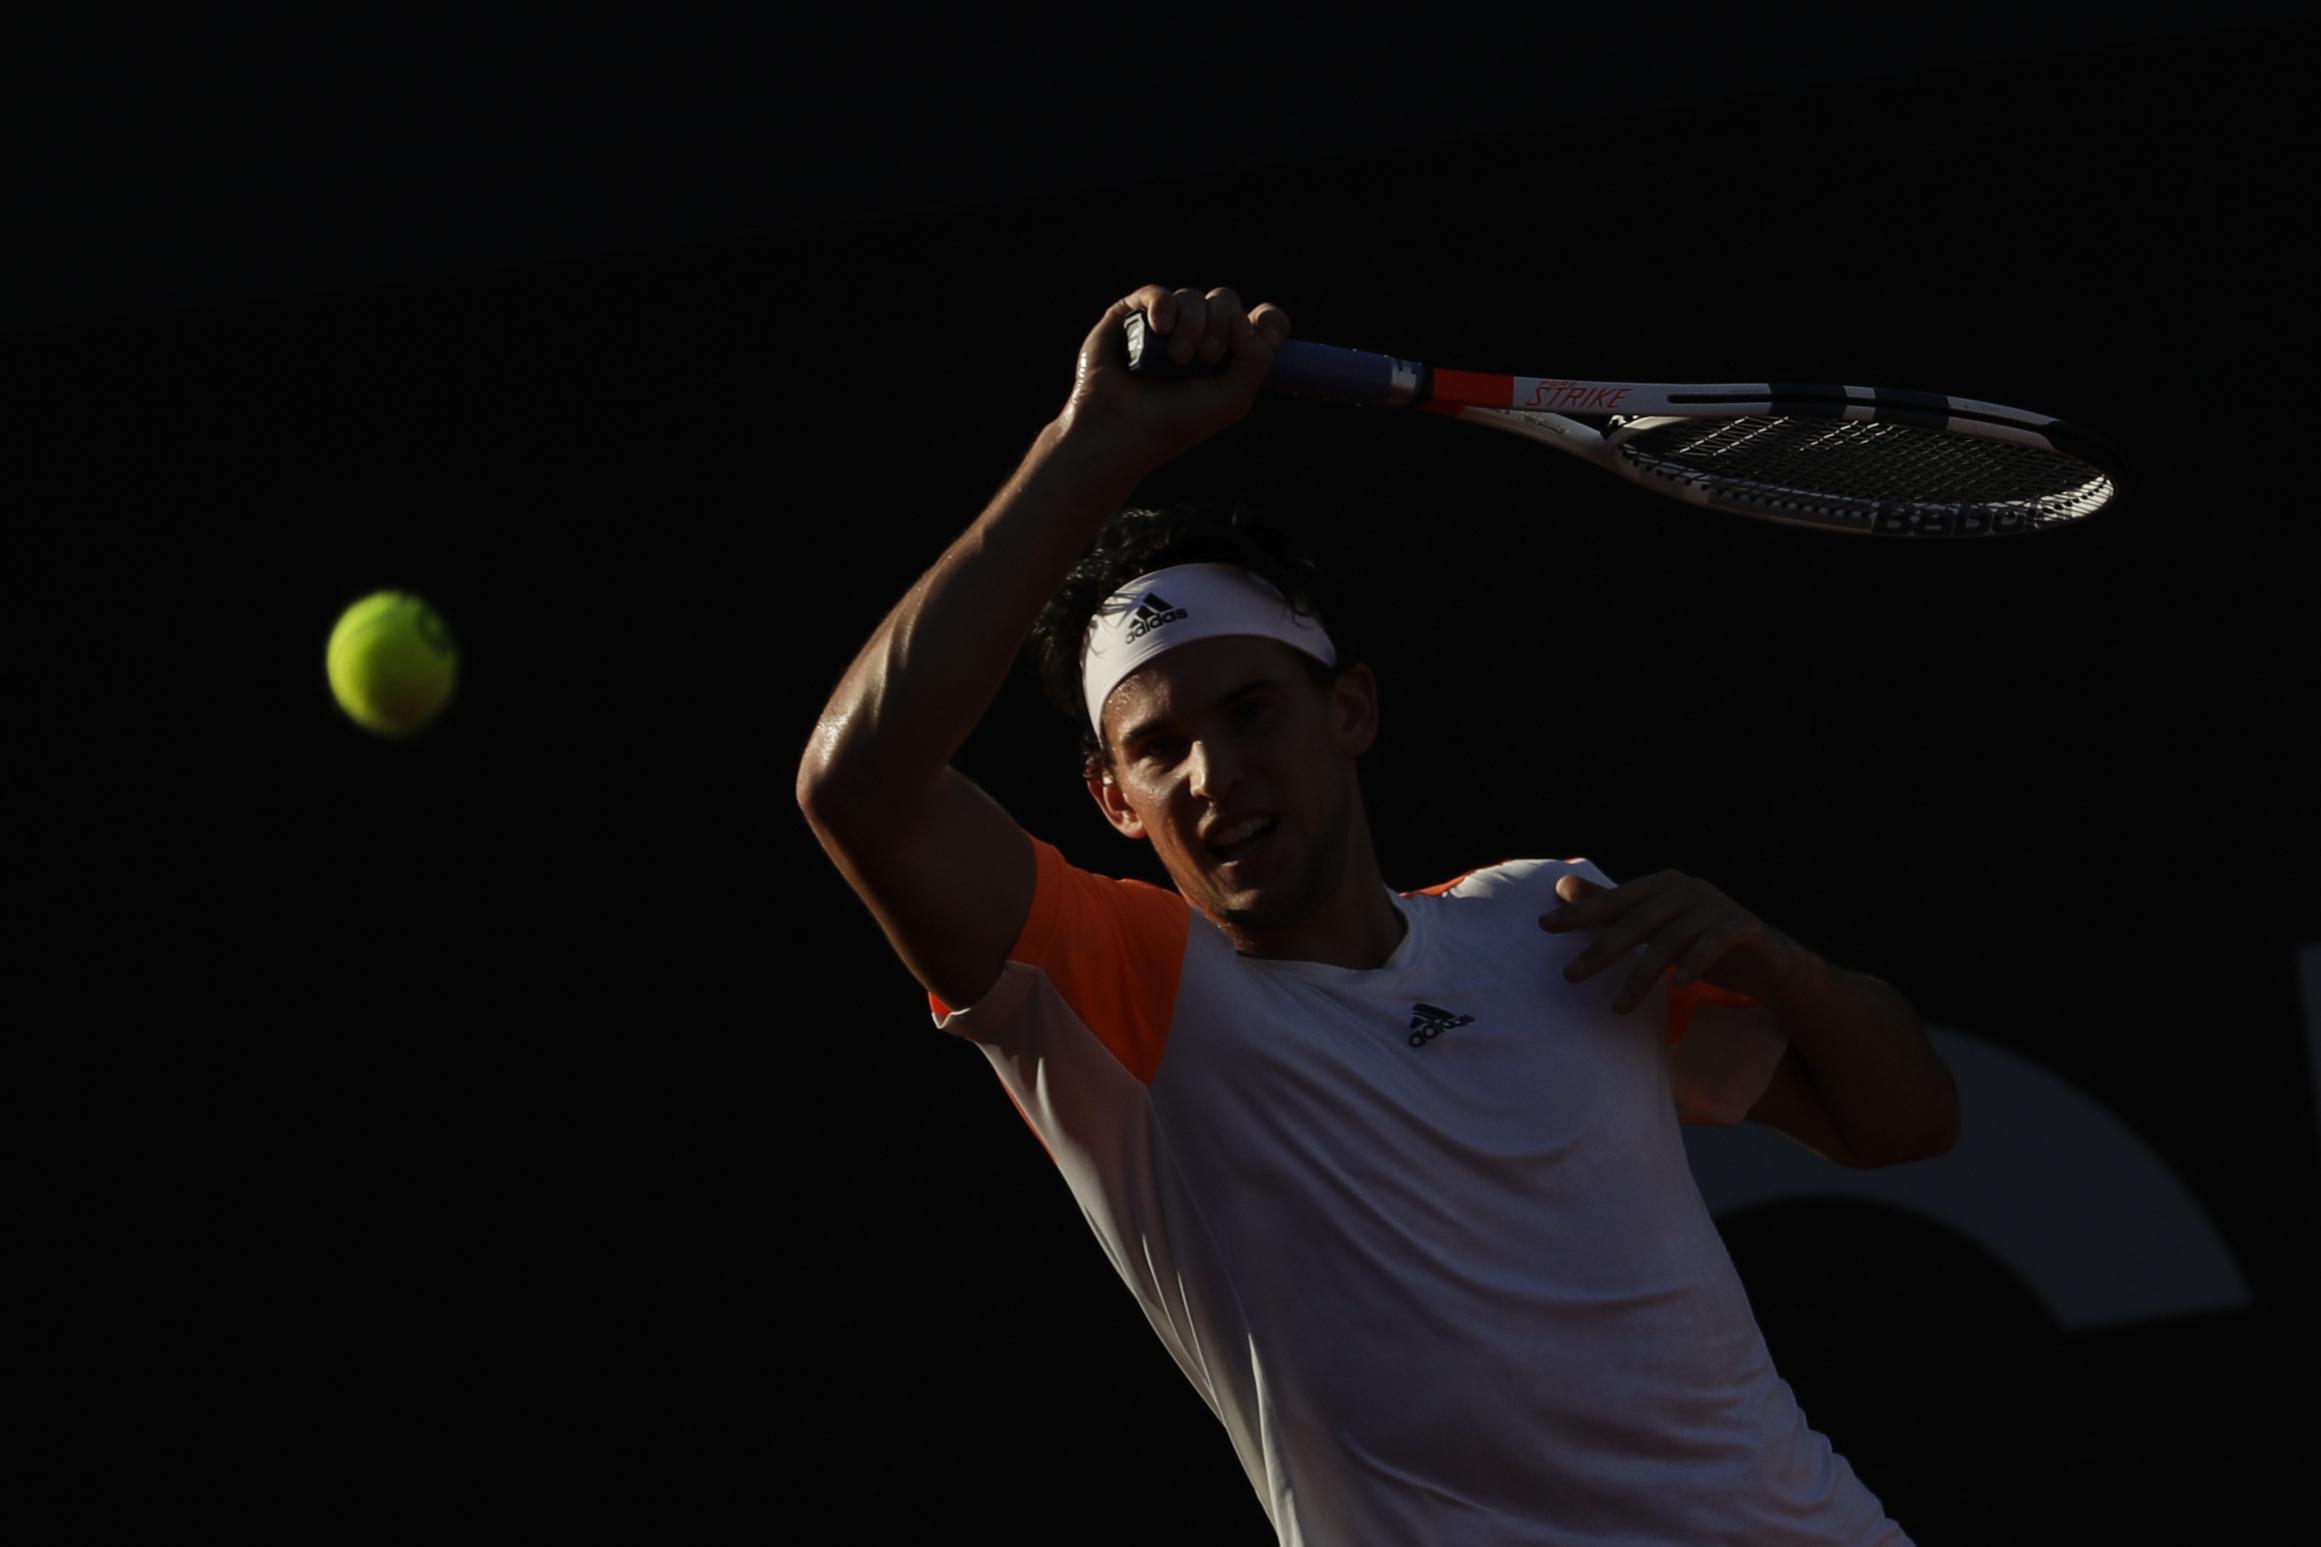 Austria's Dominic Thiem returns the ball to Argentina's Diego Schwartzman at the Rio Open tennis tournament in Rio de Janeiro, Brazil, Friday, Feb. 24, 2017. (AP Photo/Felipe Dana)